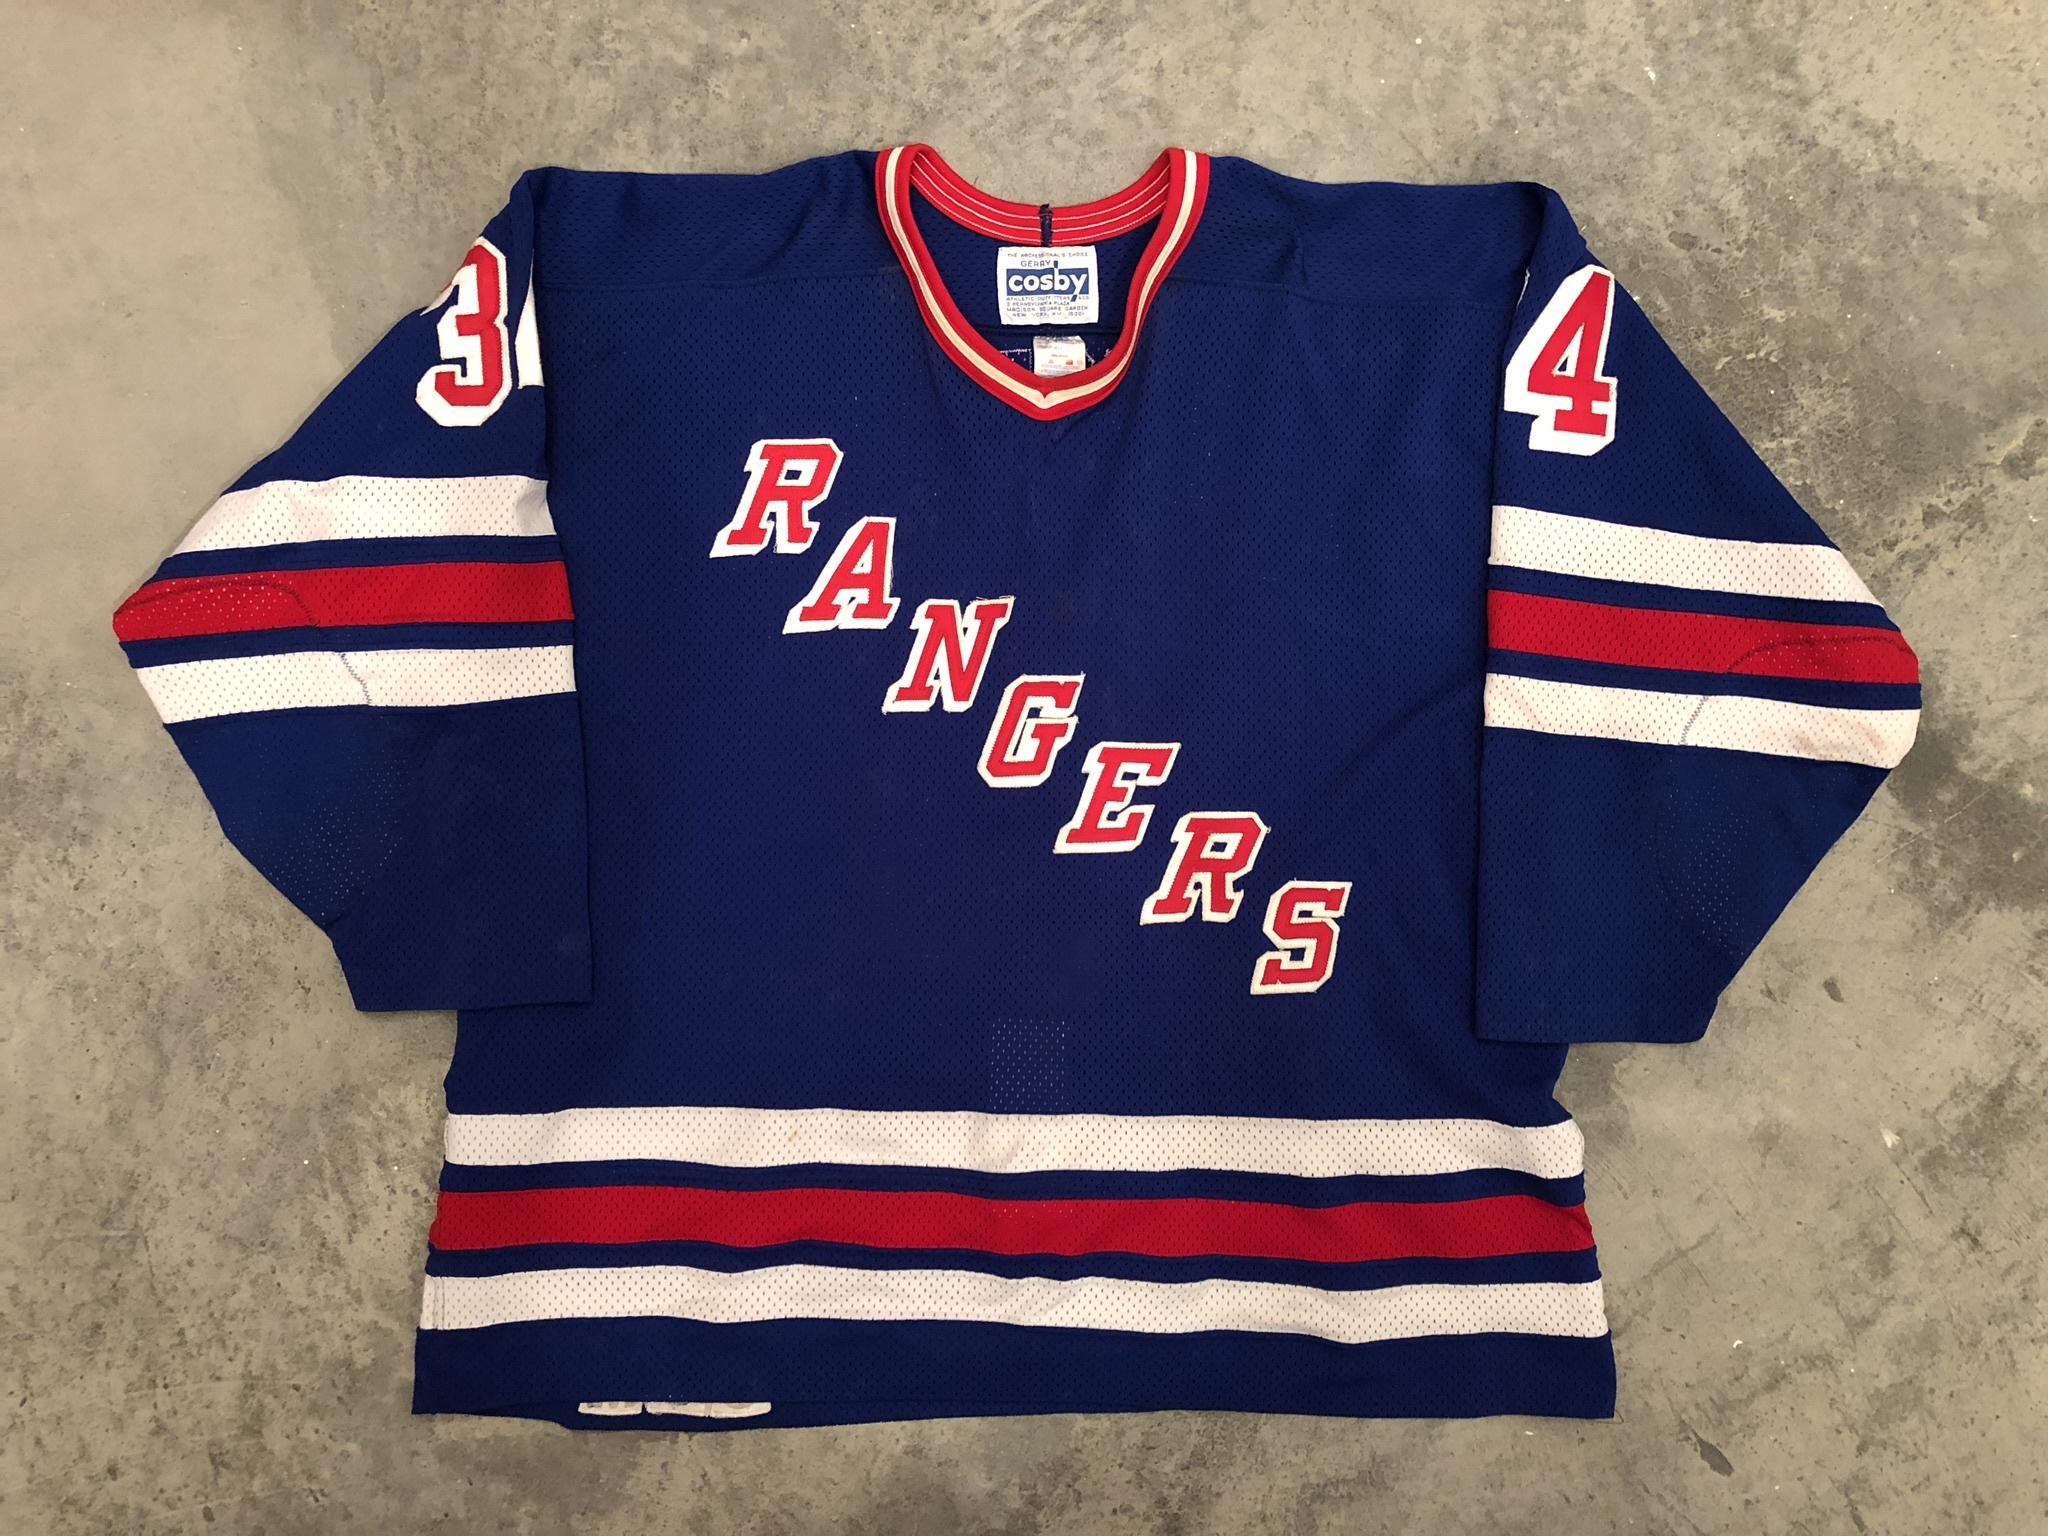 1987-88 John Vanbiesbrouck Game Worn Road Jersey